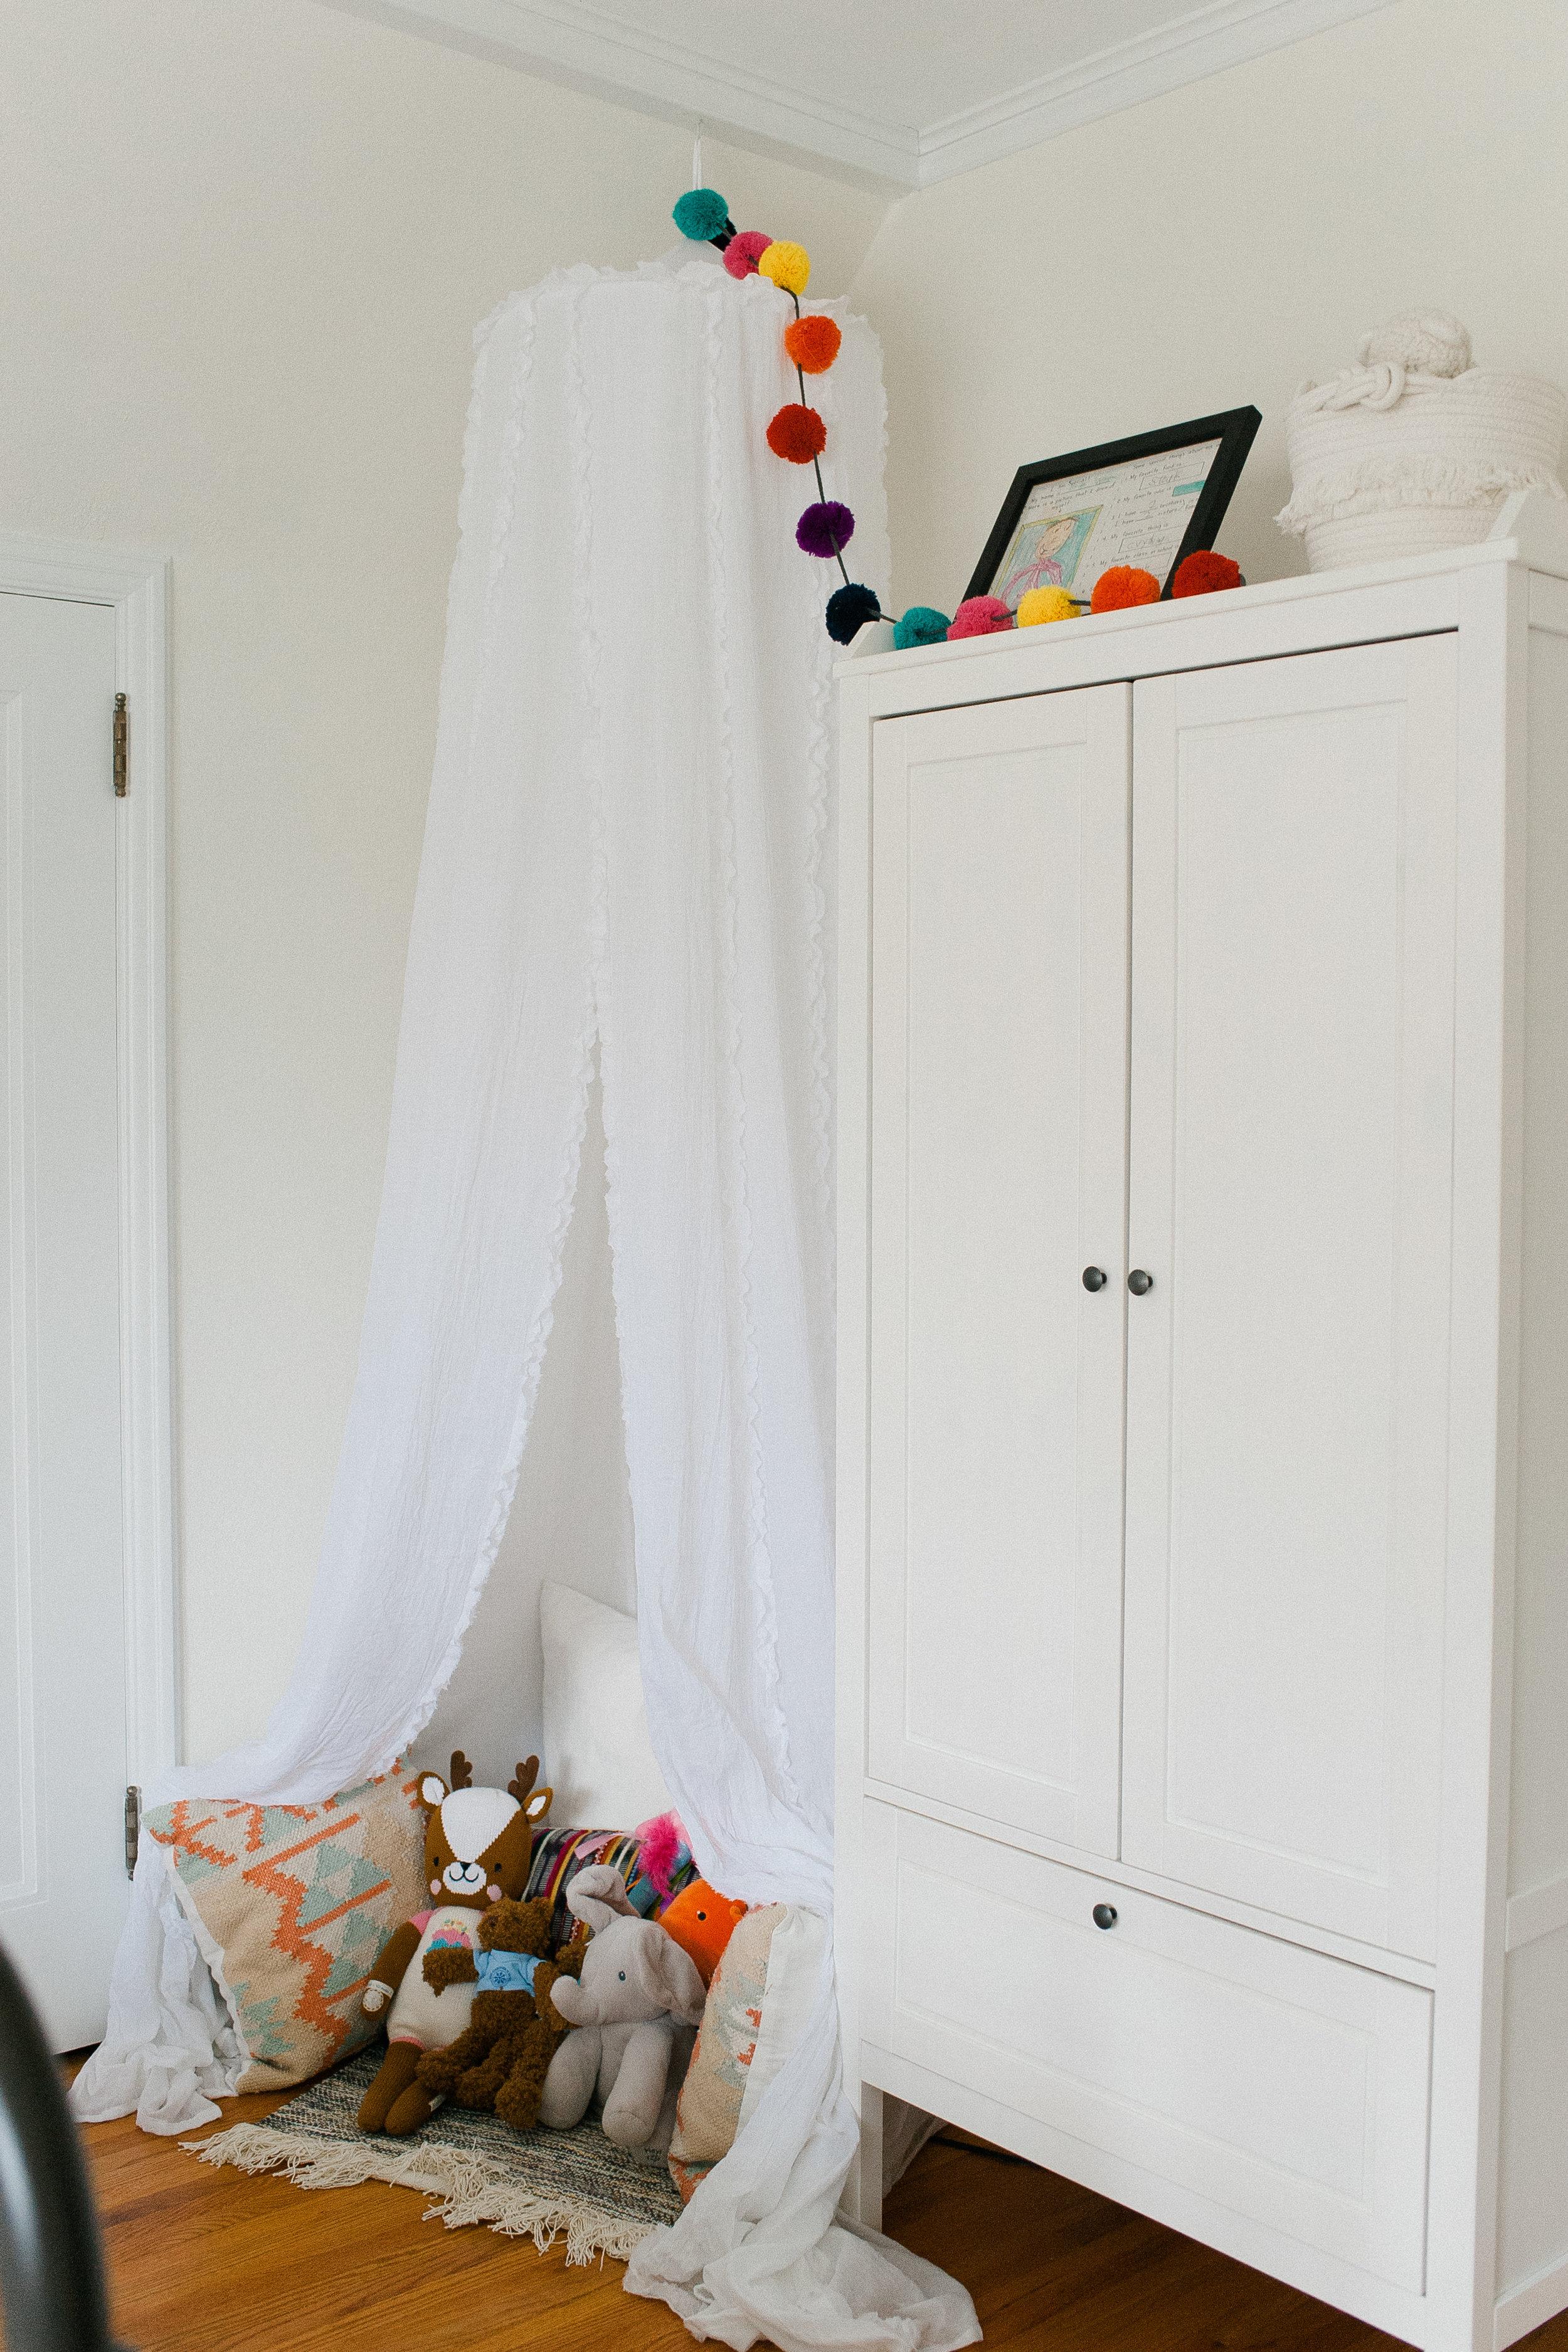 similar wardrobe closet  here  | similar canopy  here  | fabric basket  here